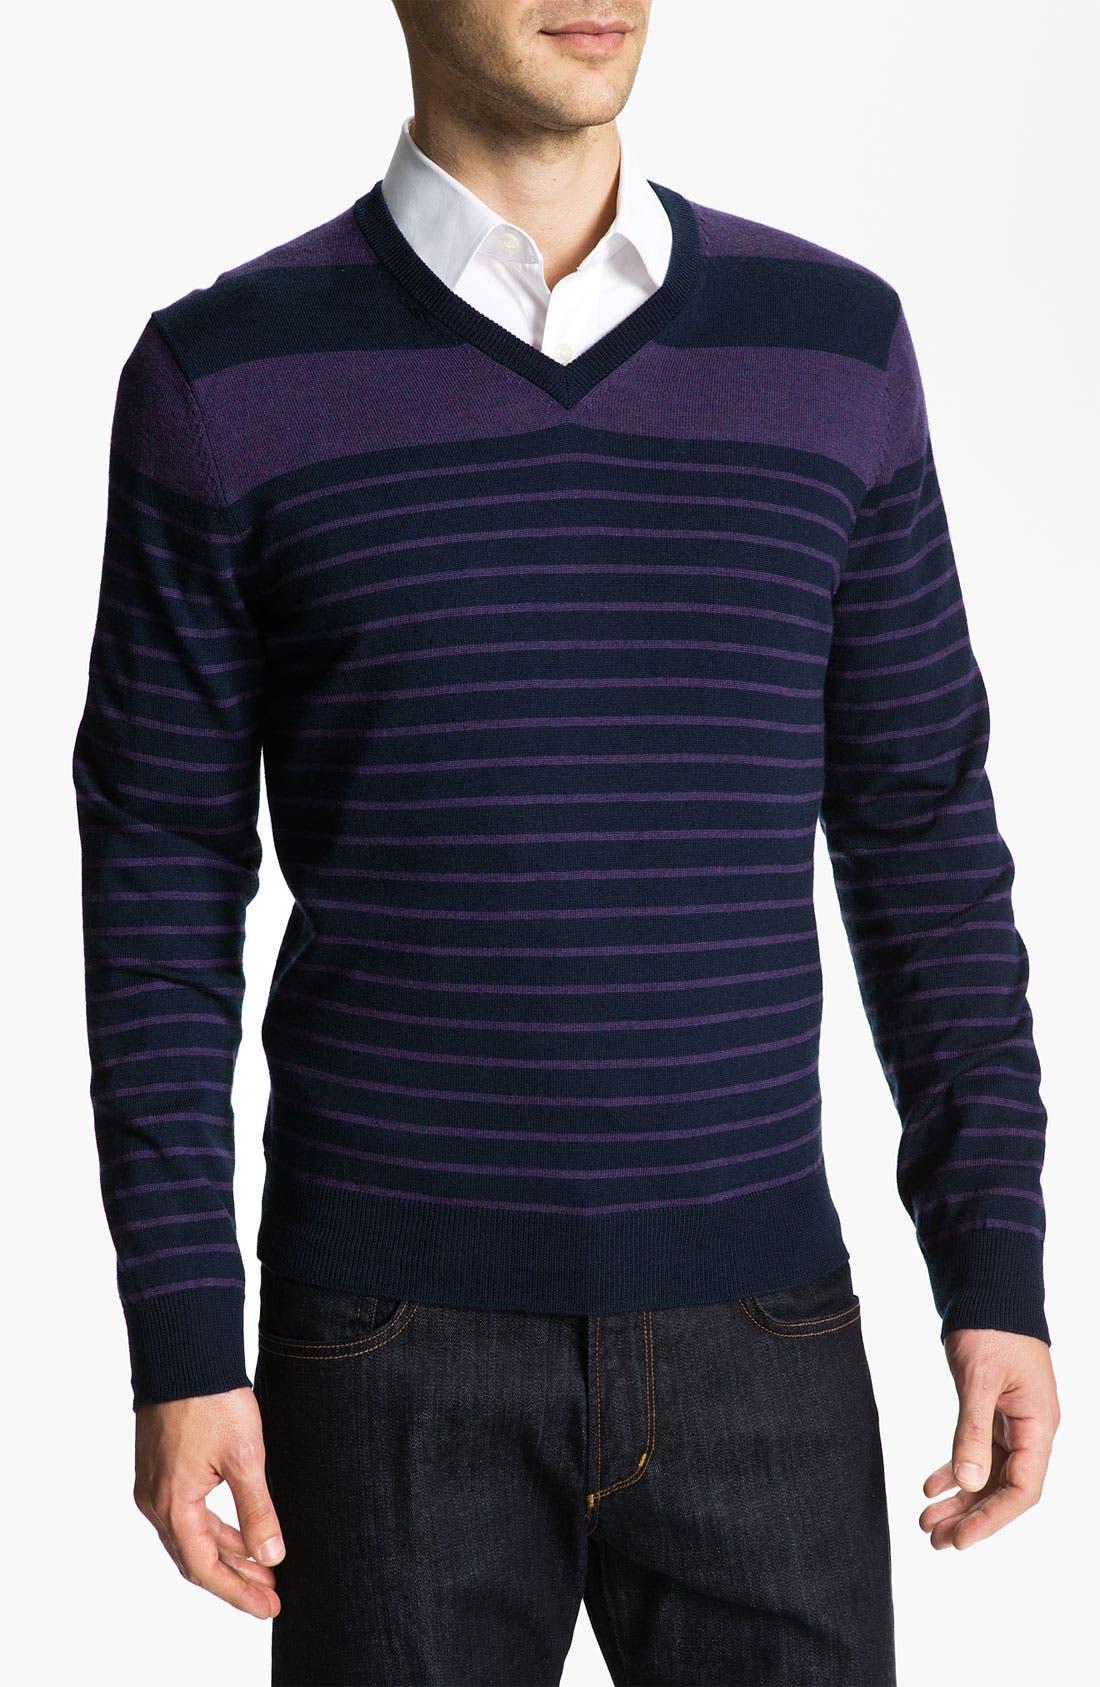 Main Image - Cullen89 Merino Wool V-Neck Sweater